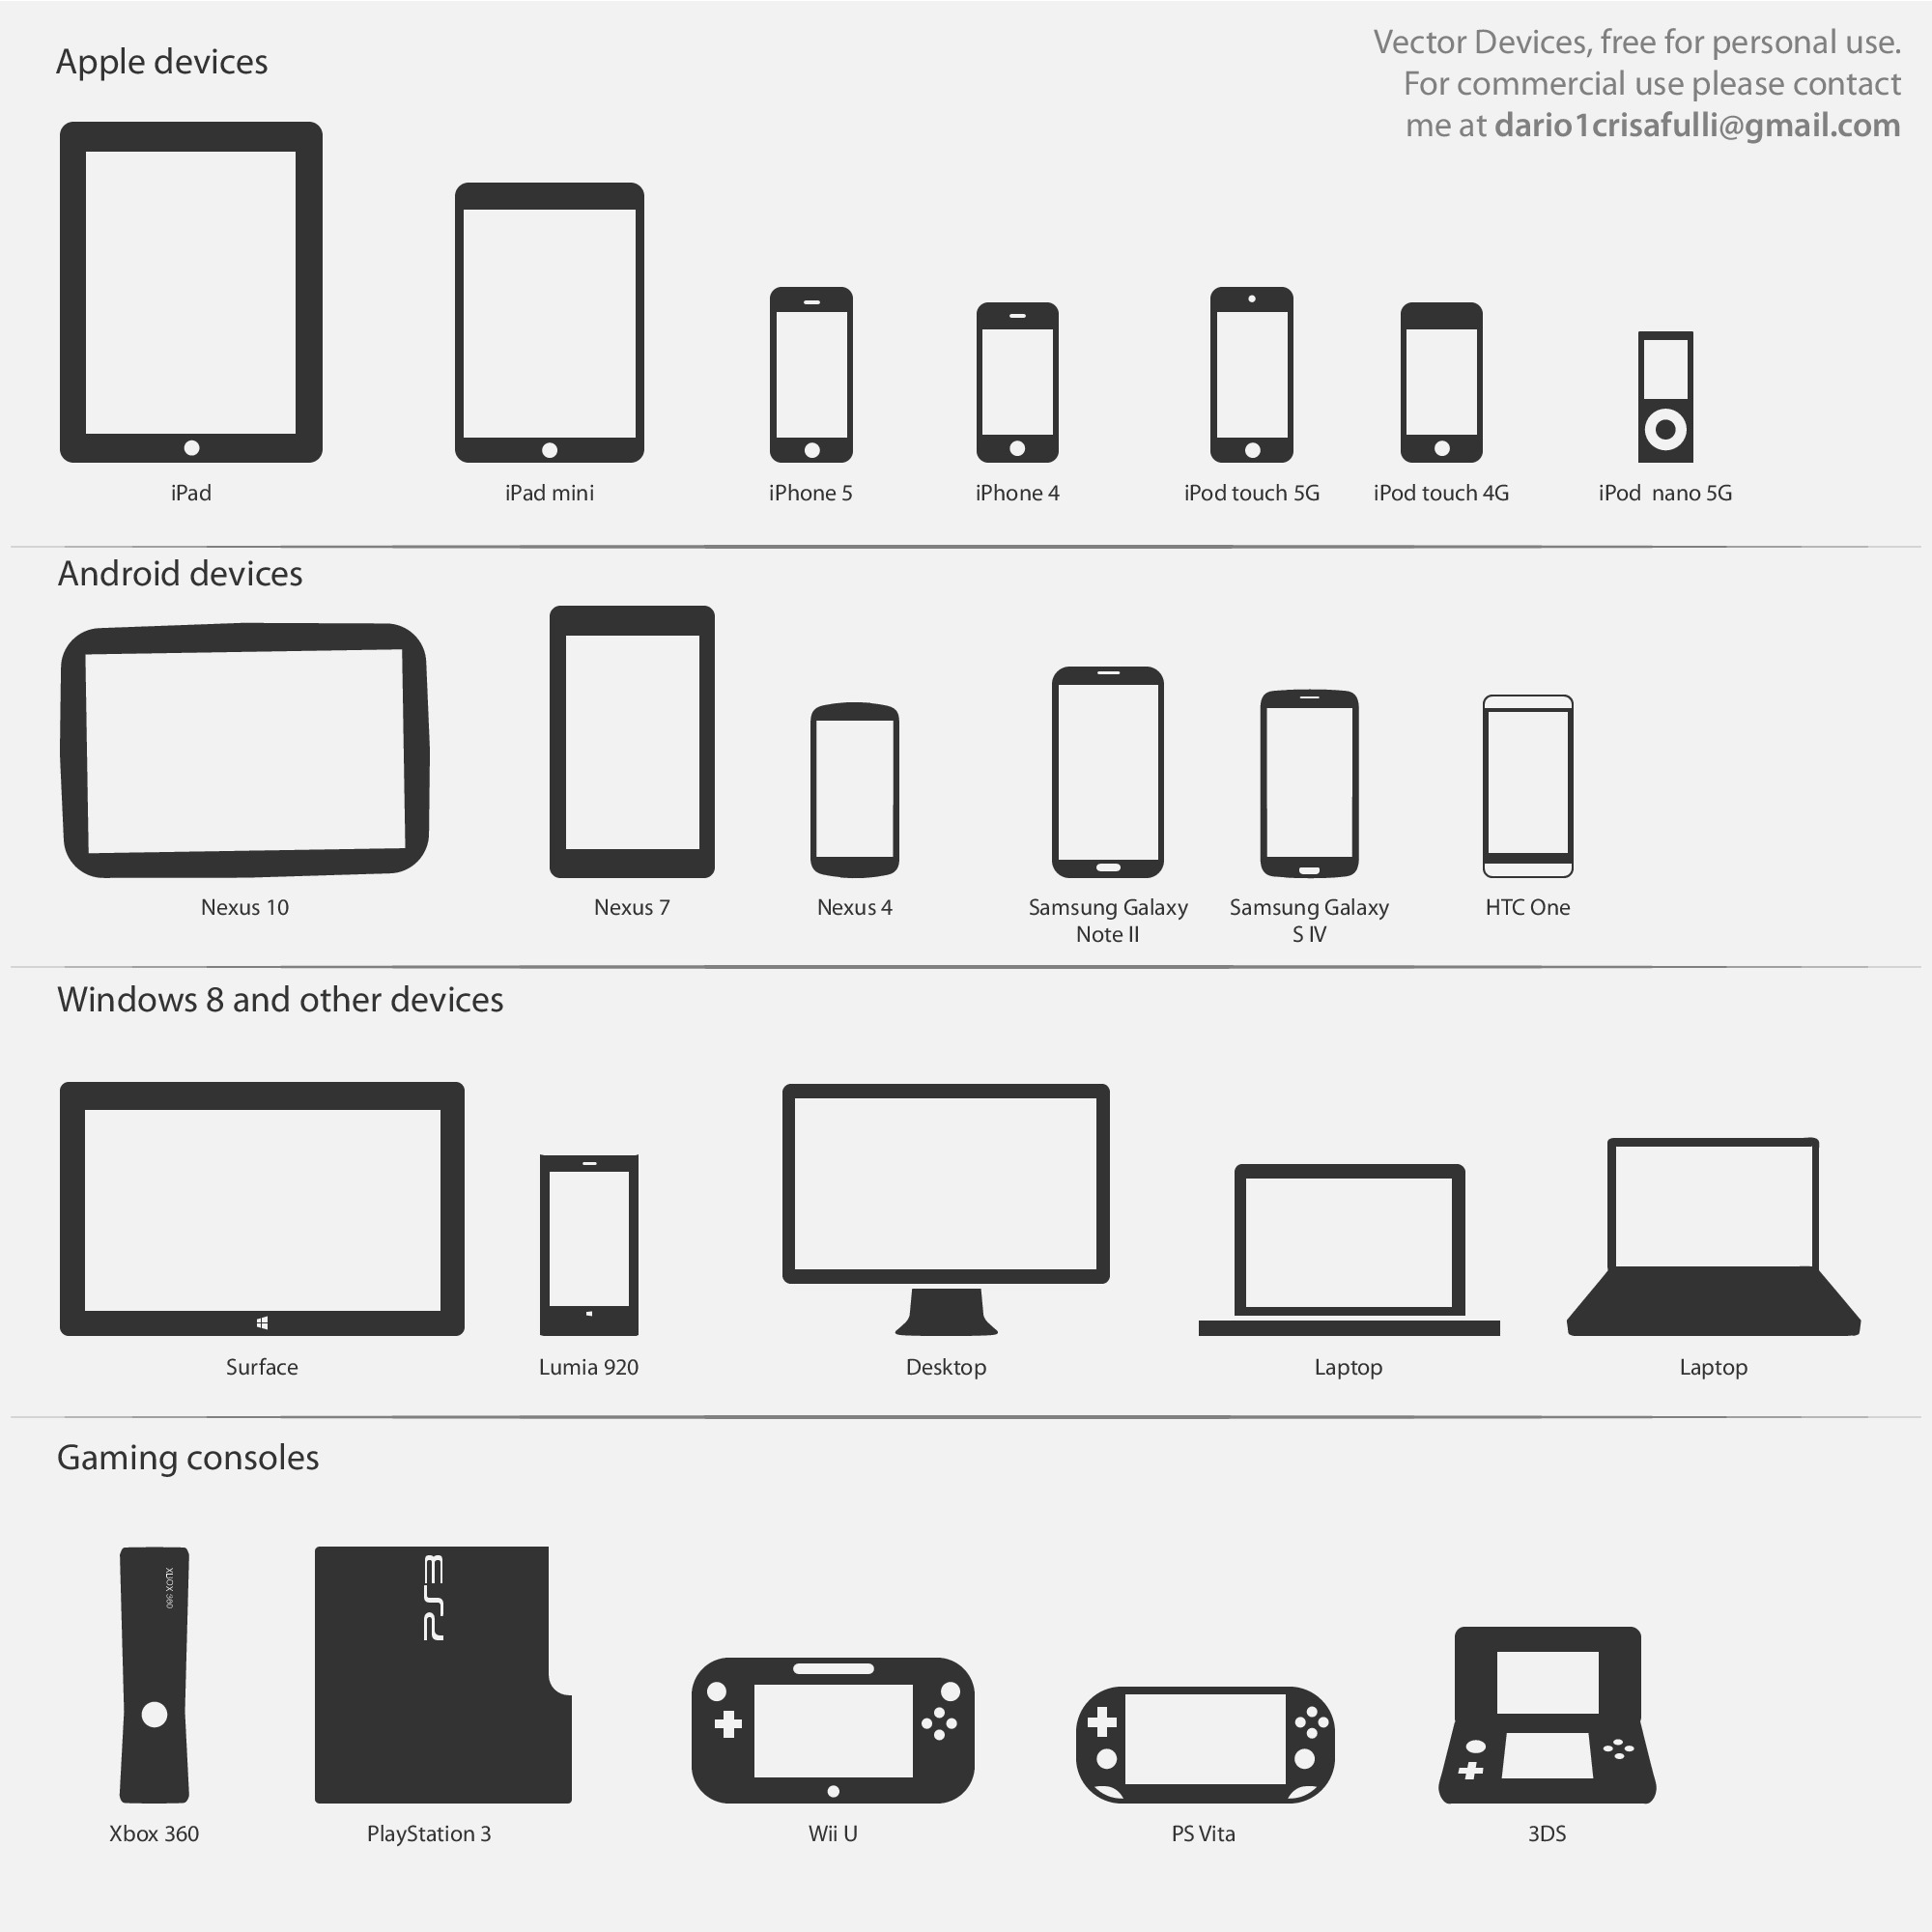 devices.ai